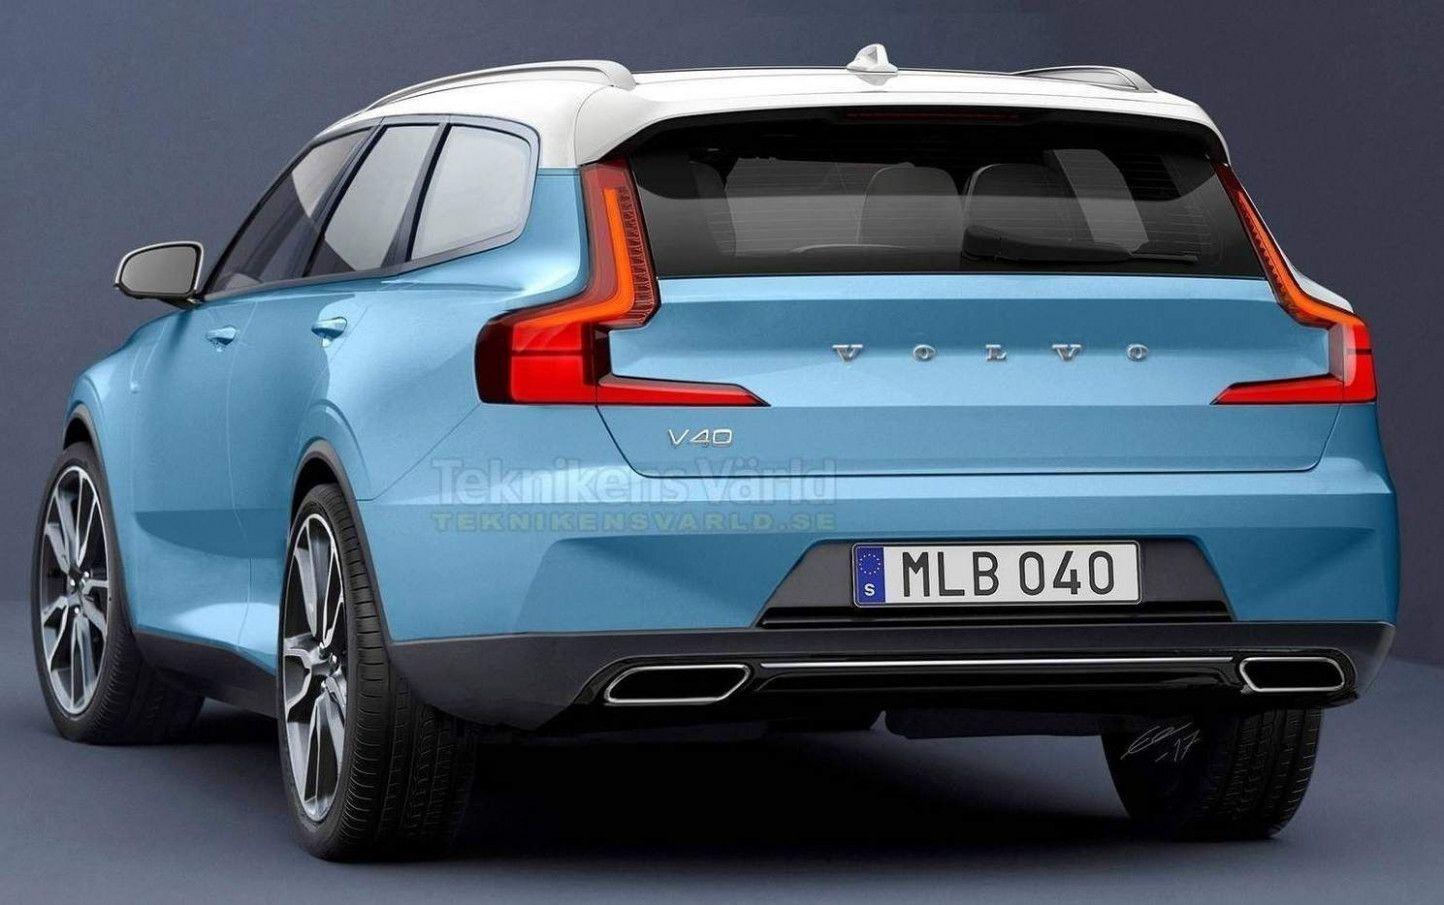 11 Picture Volvo Wagon 2020 In 2020 Volvo Wagon Volvo Volvo Cars